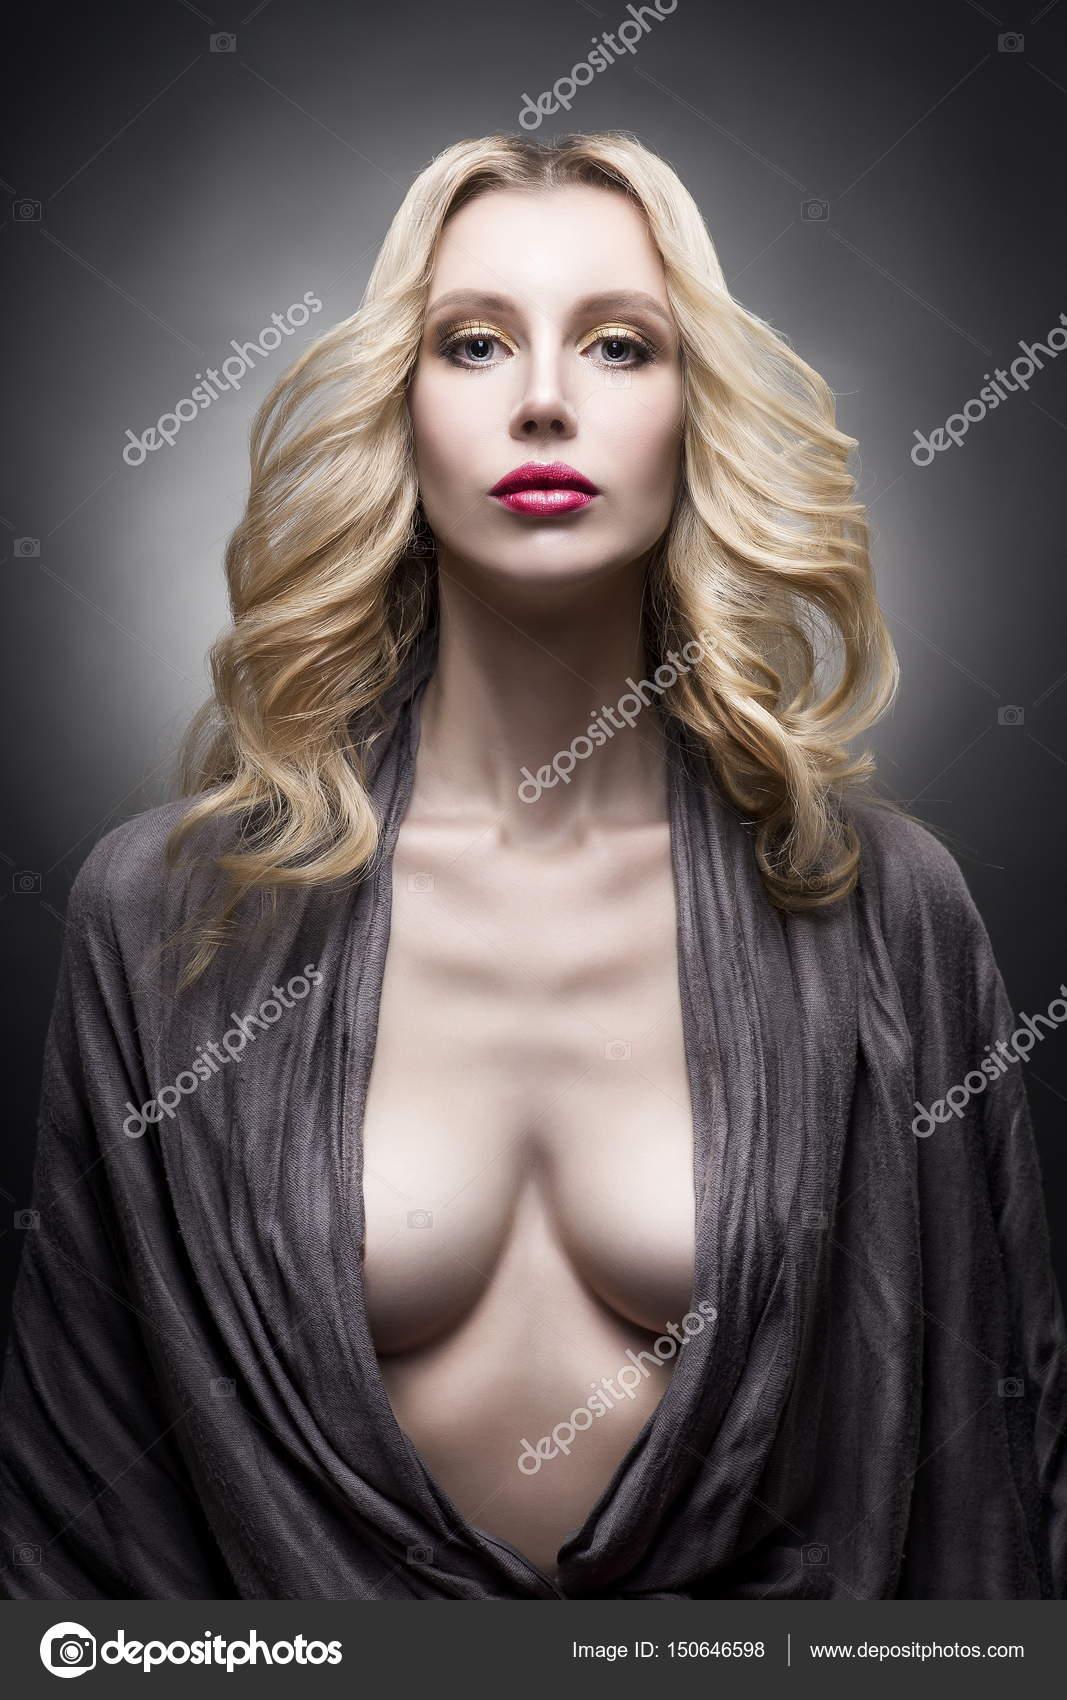 Big breast pics free consider